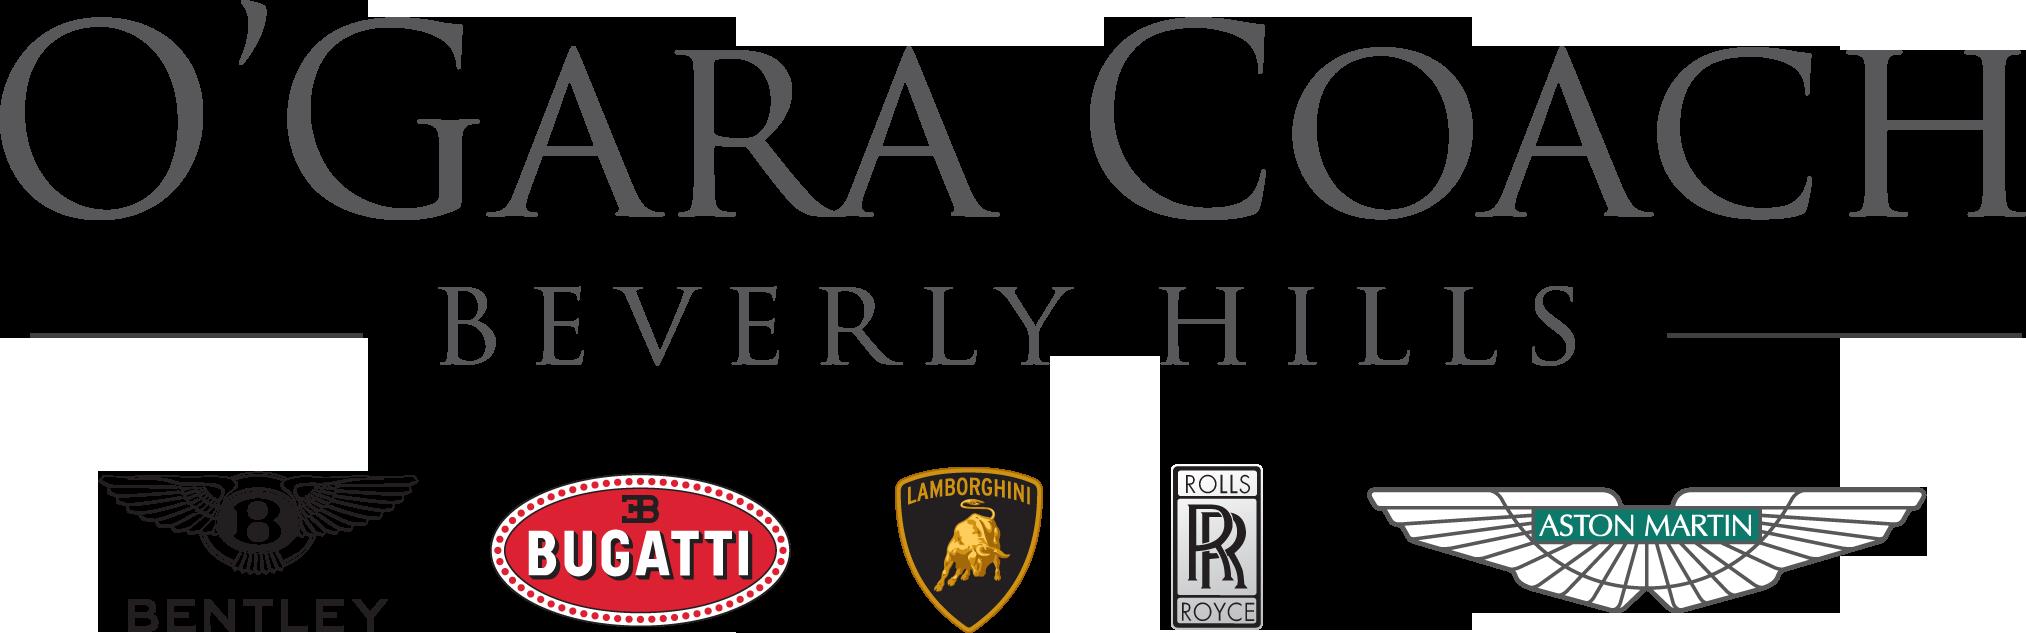 O'Gara Coach beverly Hills